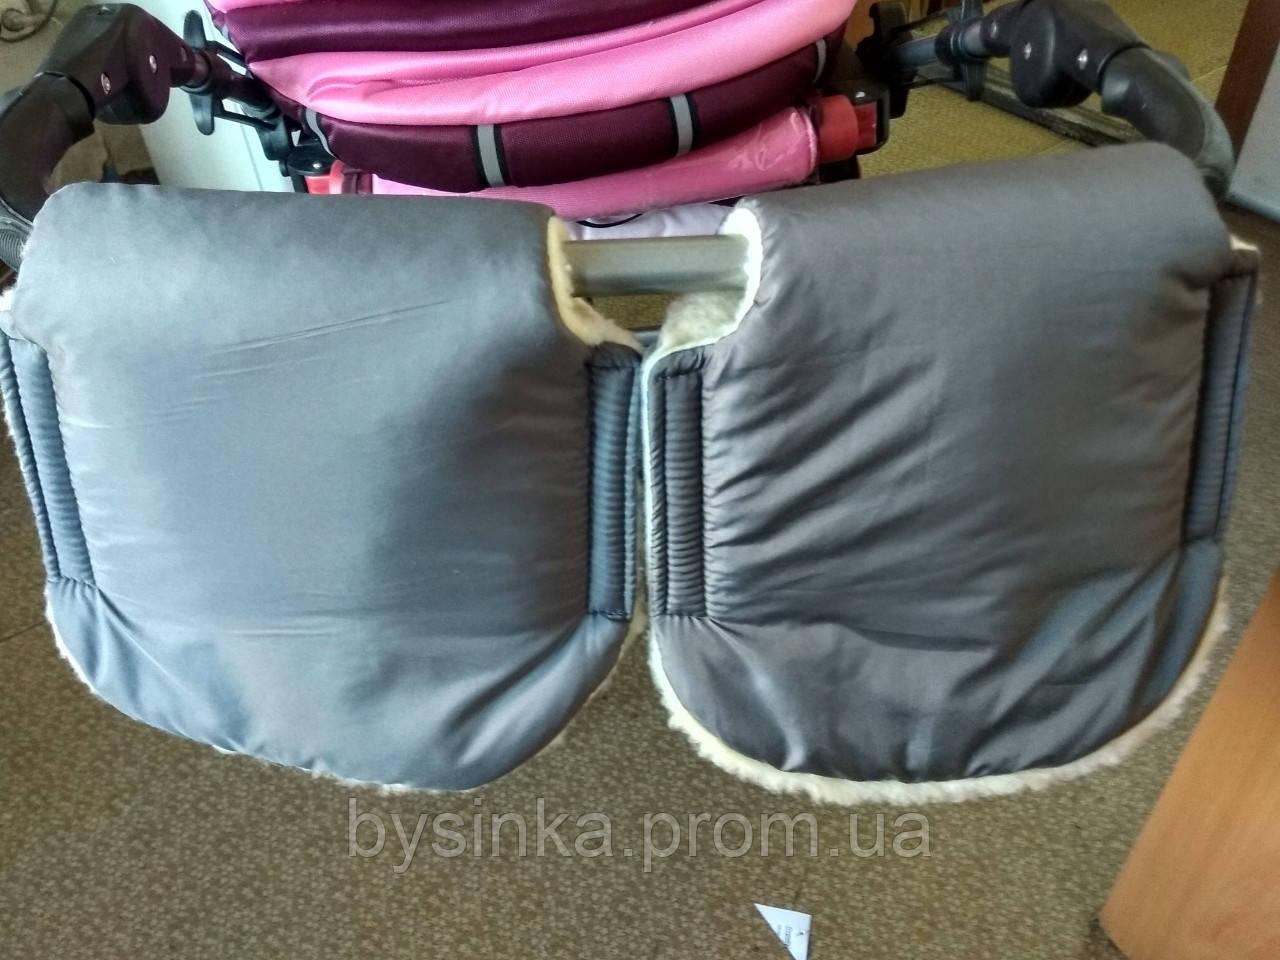 Рукавицы для коляски на коляску санки зимние муфта на овчине